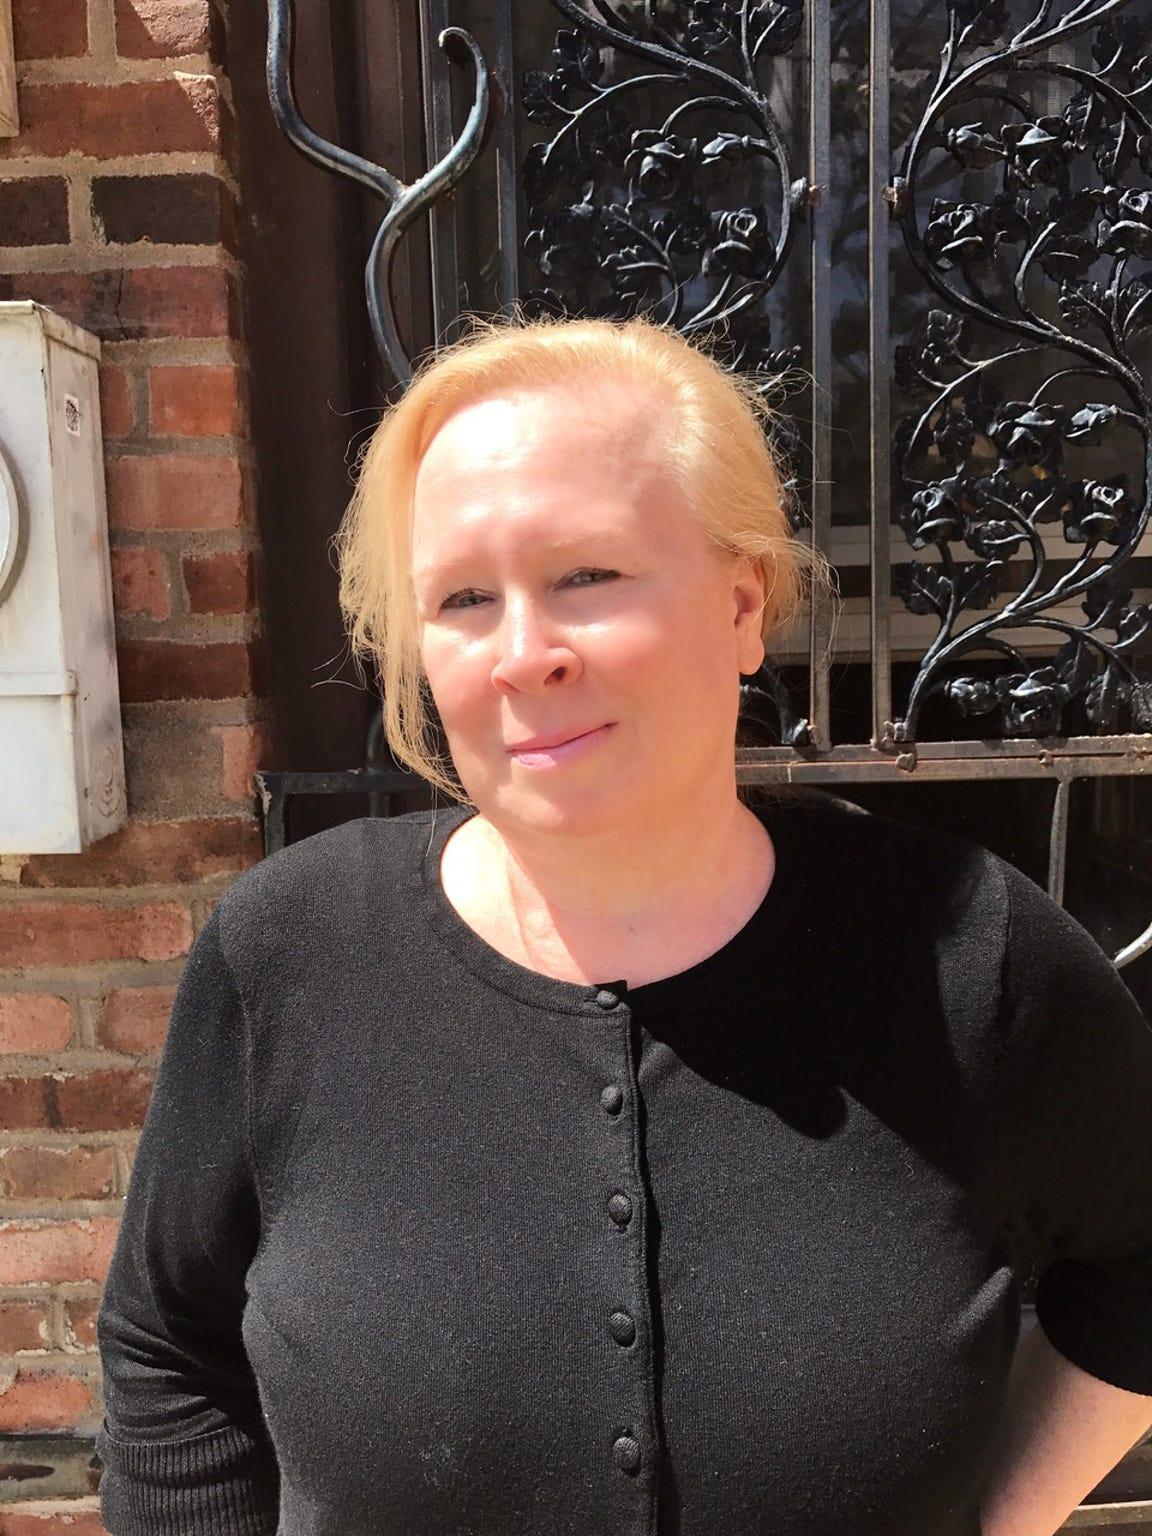 Mary Beth Burke was hoping her job at Havasupai Elementary